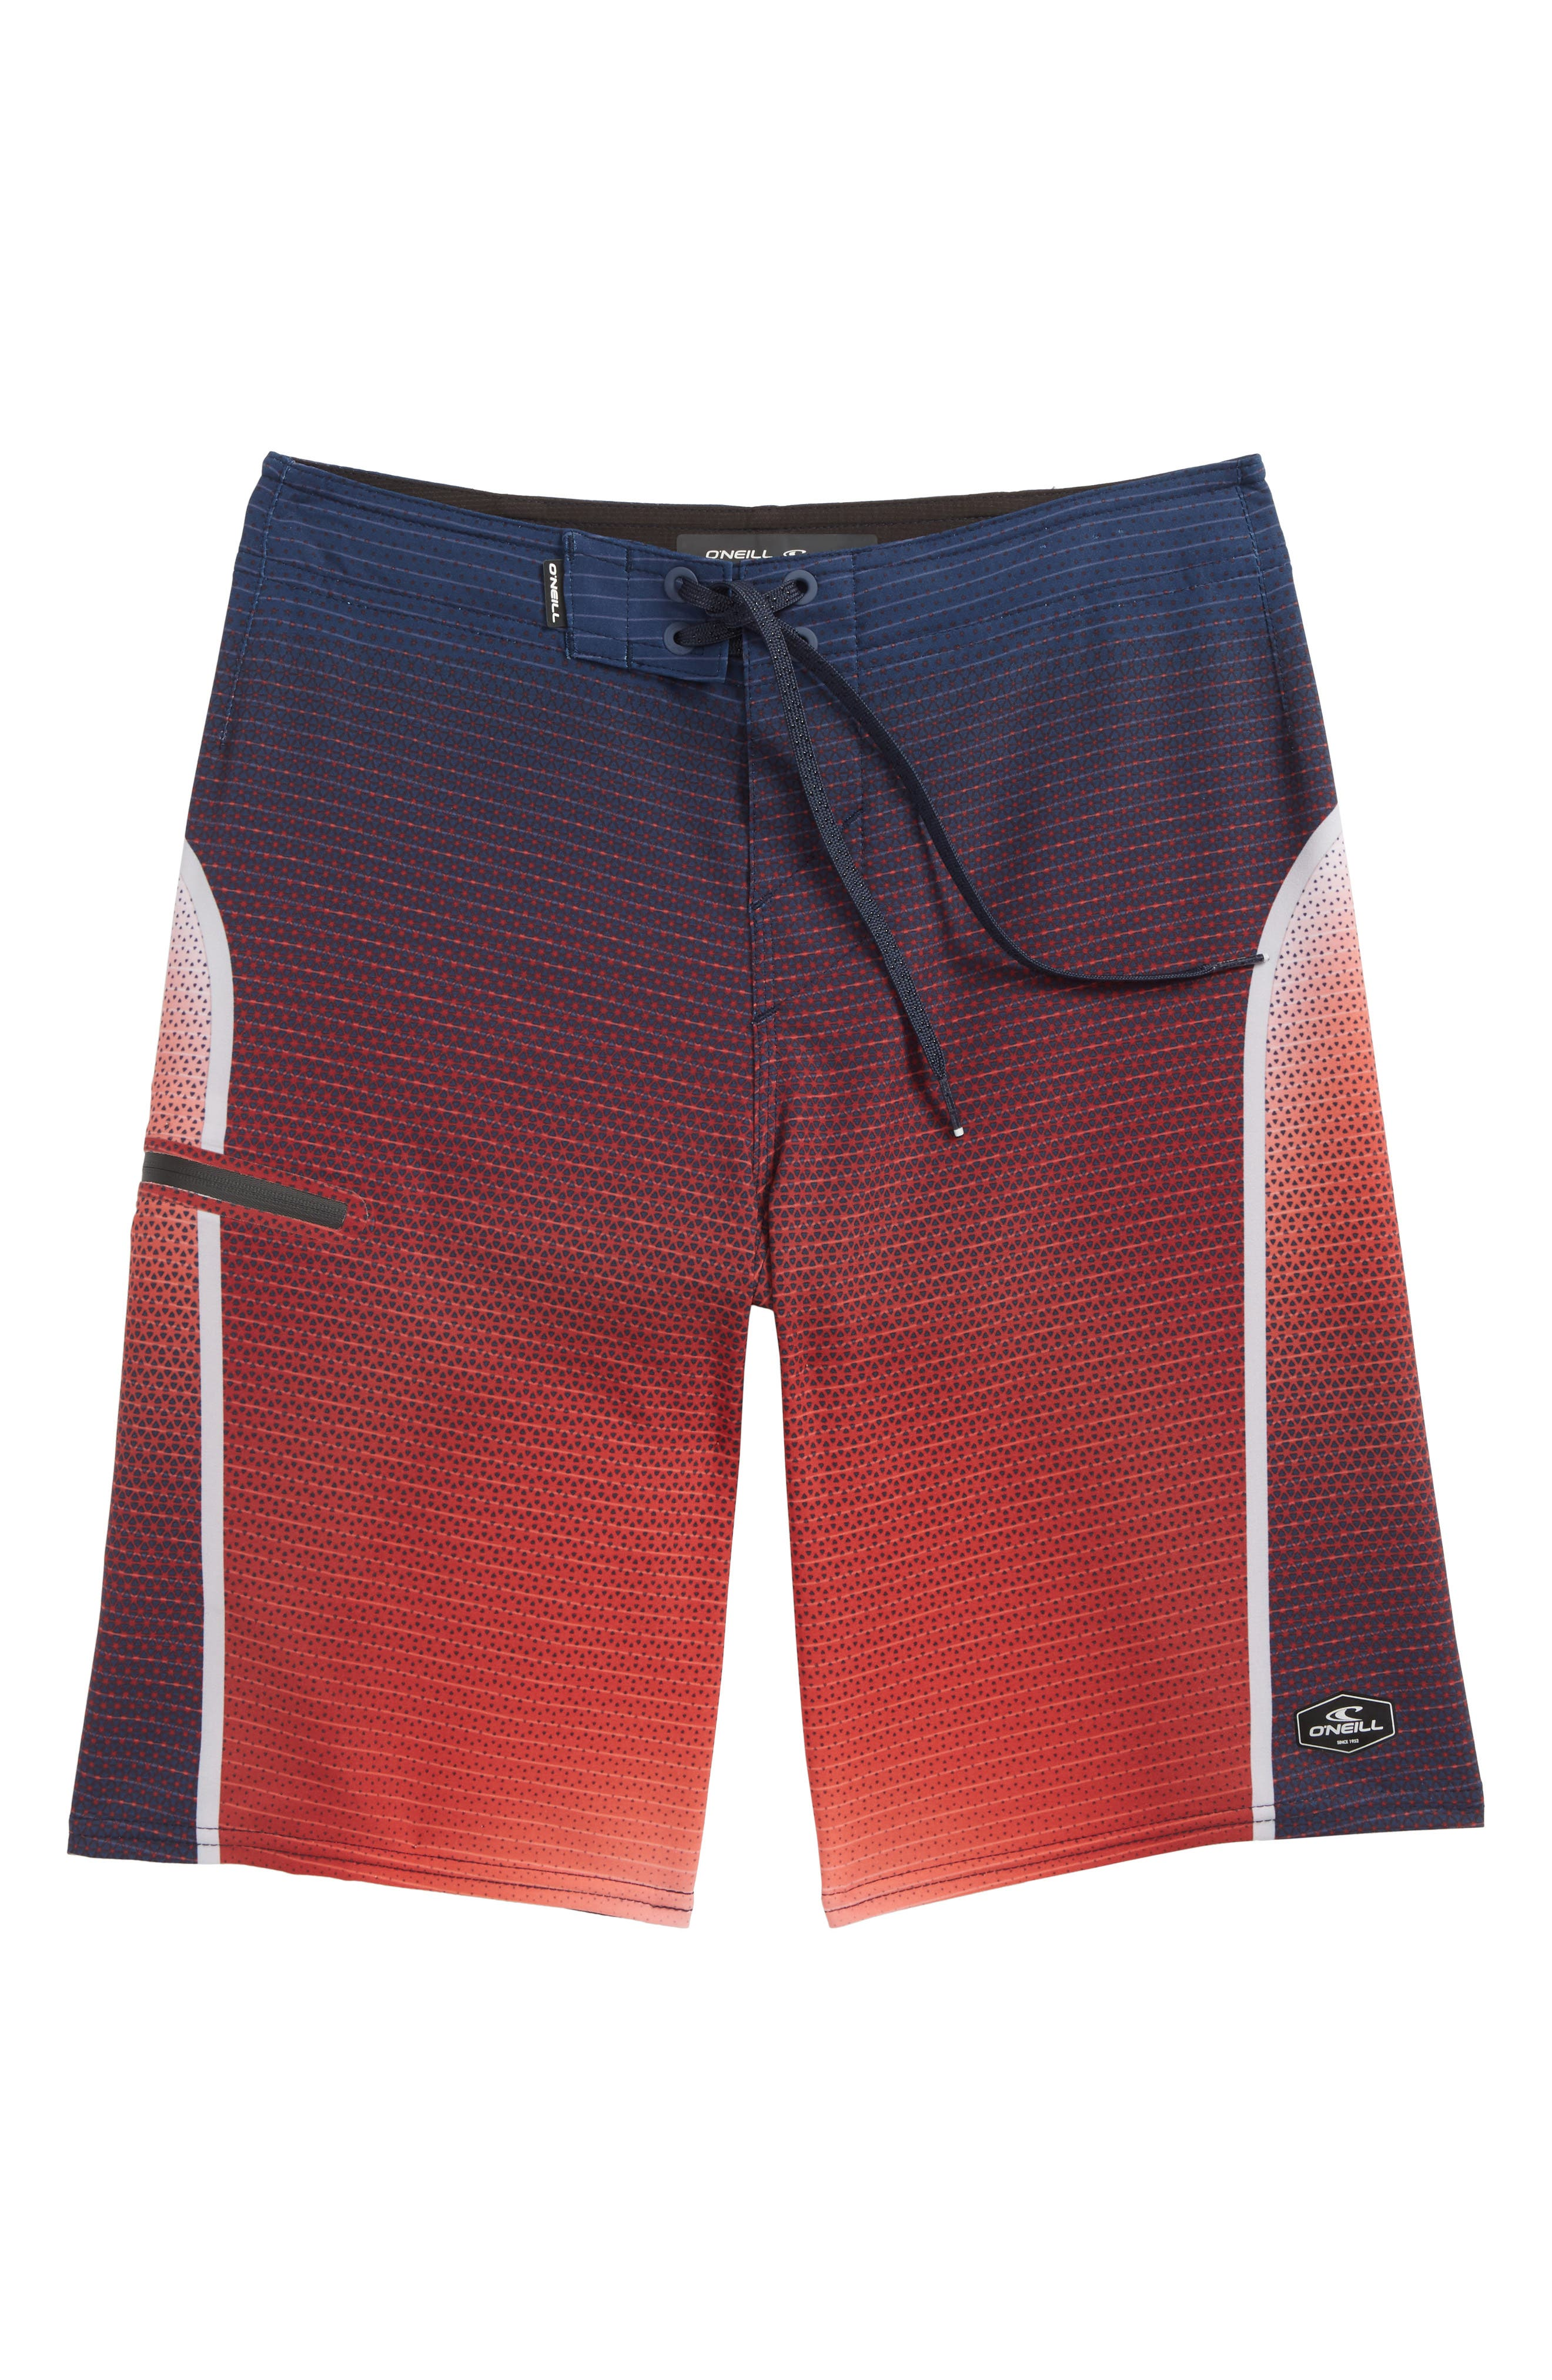 Hyperfreak Prizma Board Shorts,                             Main thumbnail 1, color,                             600